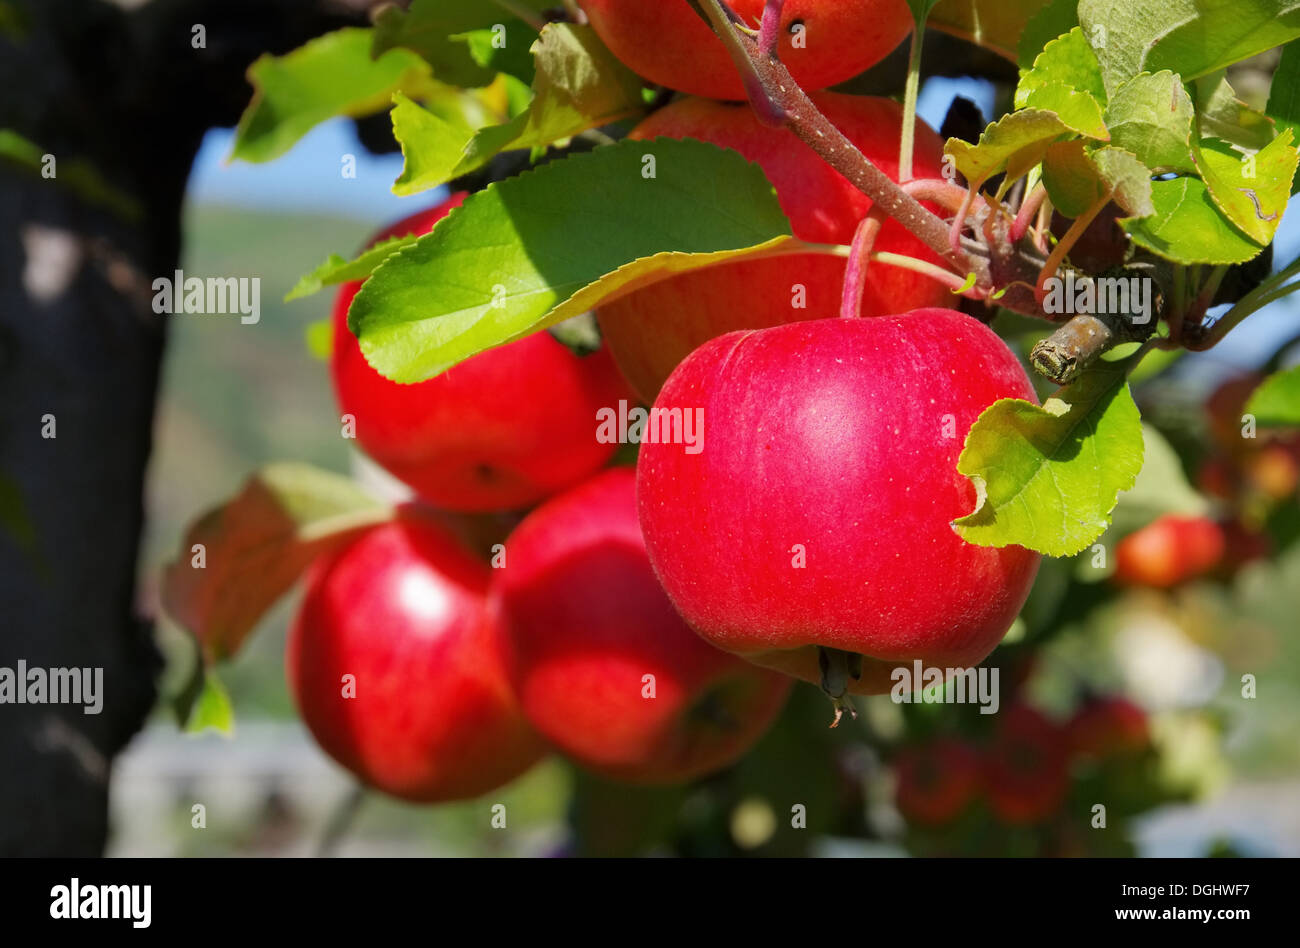 Apfel am Baum - apple on tree 151 - Stock Image